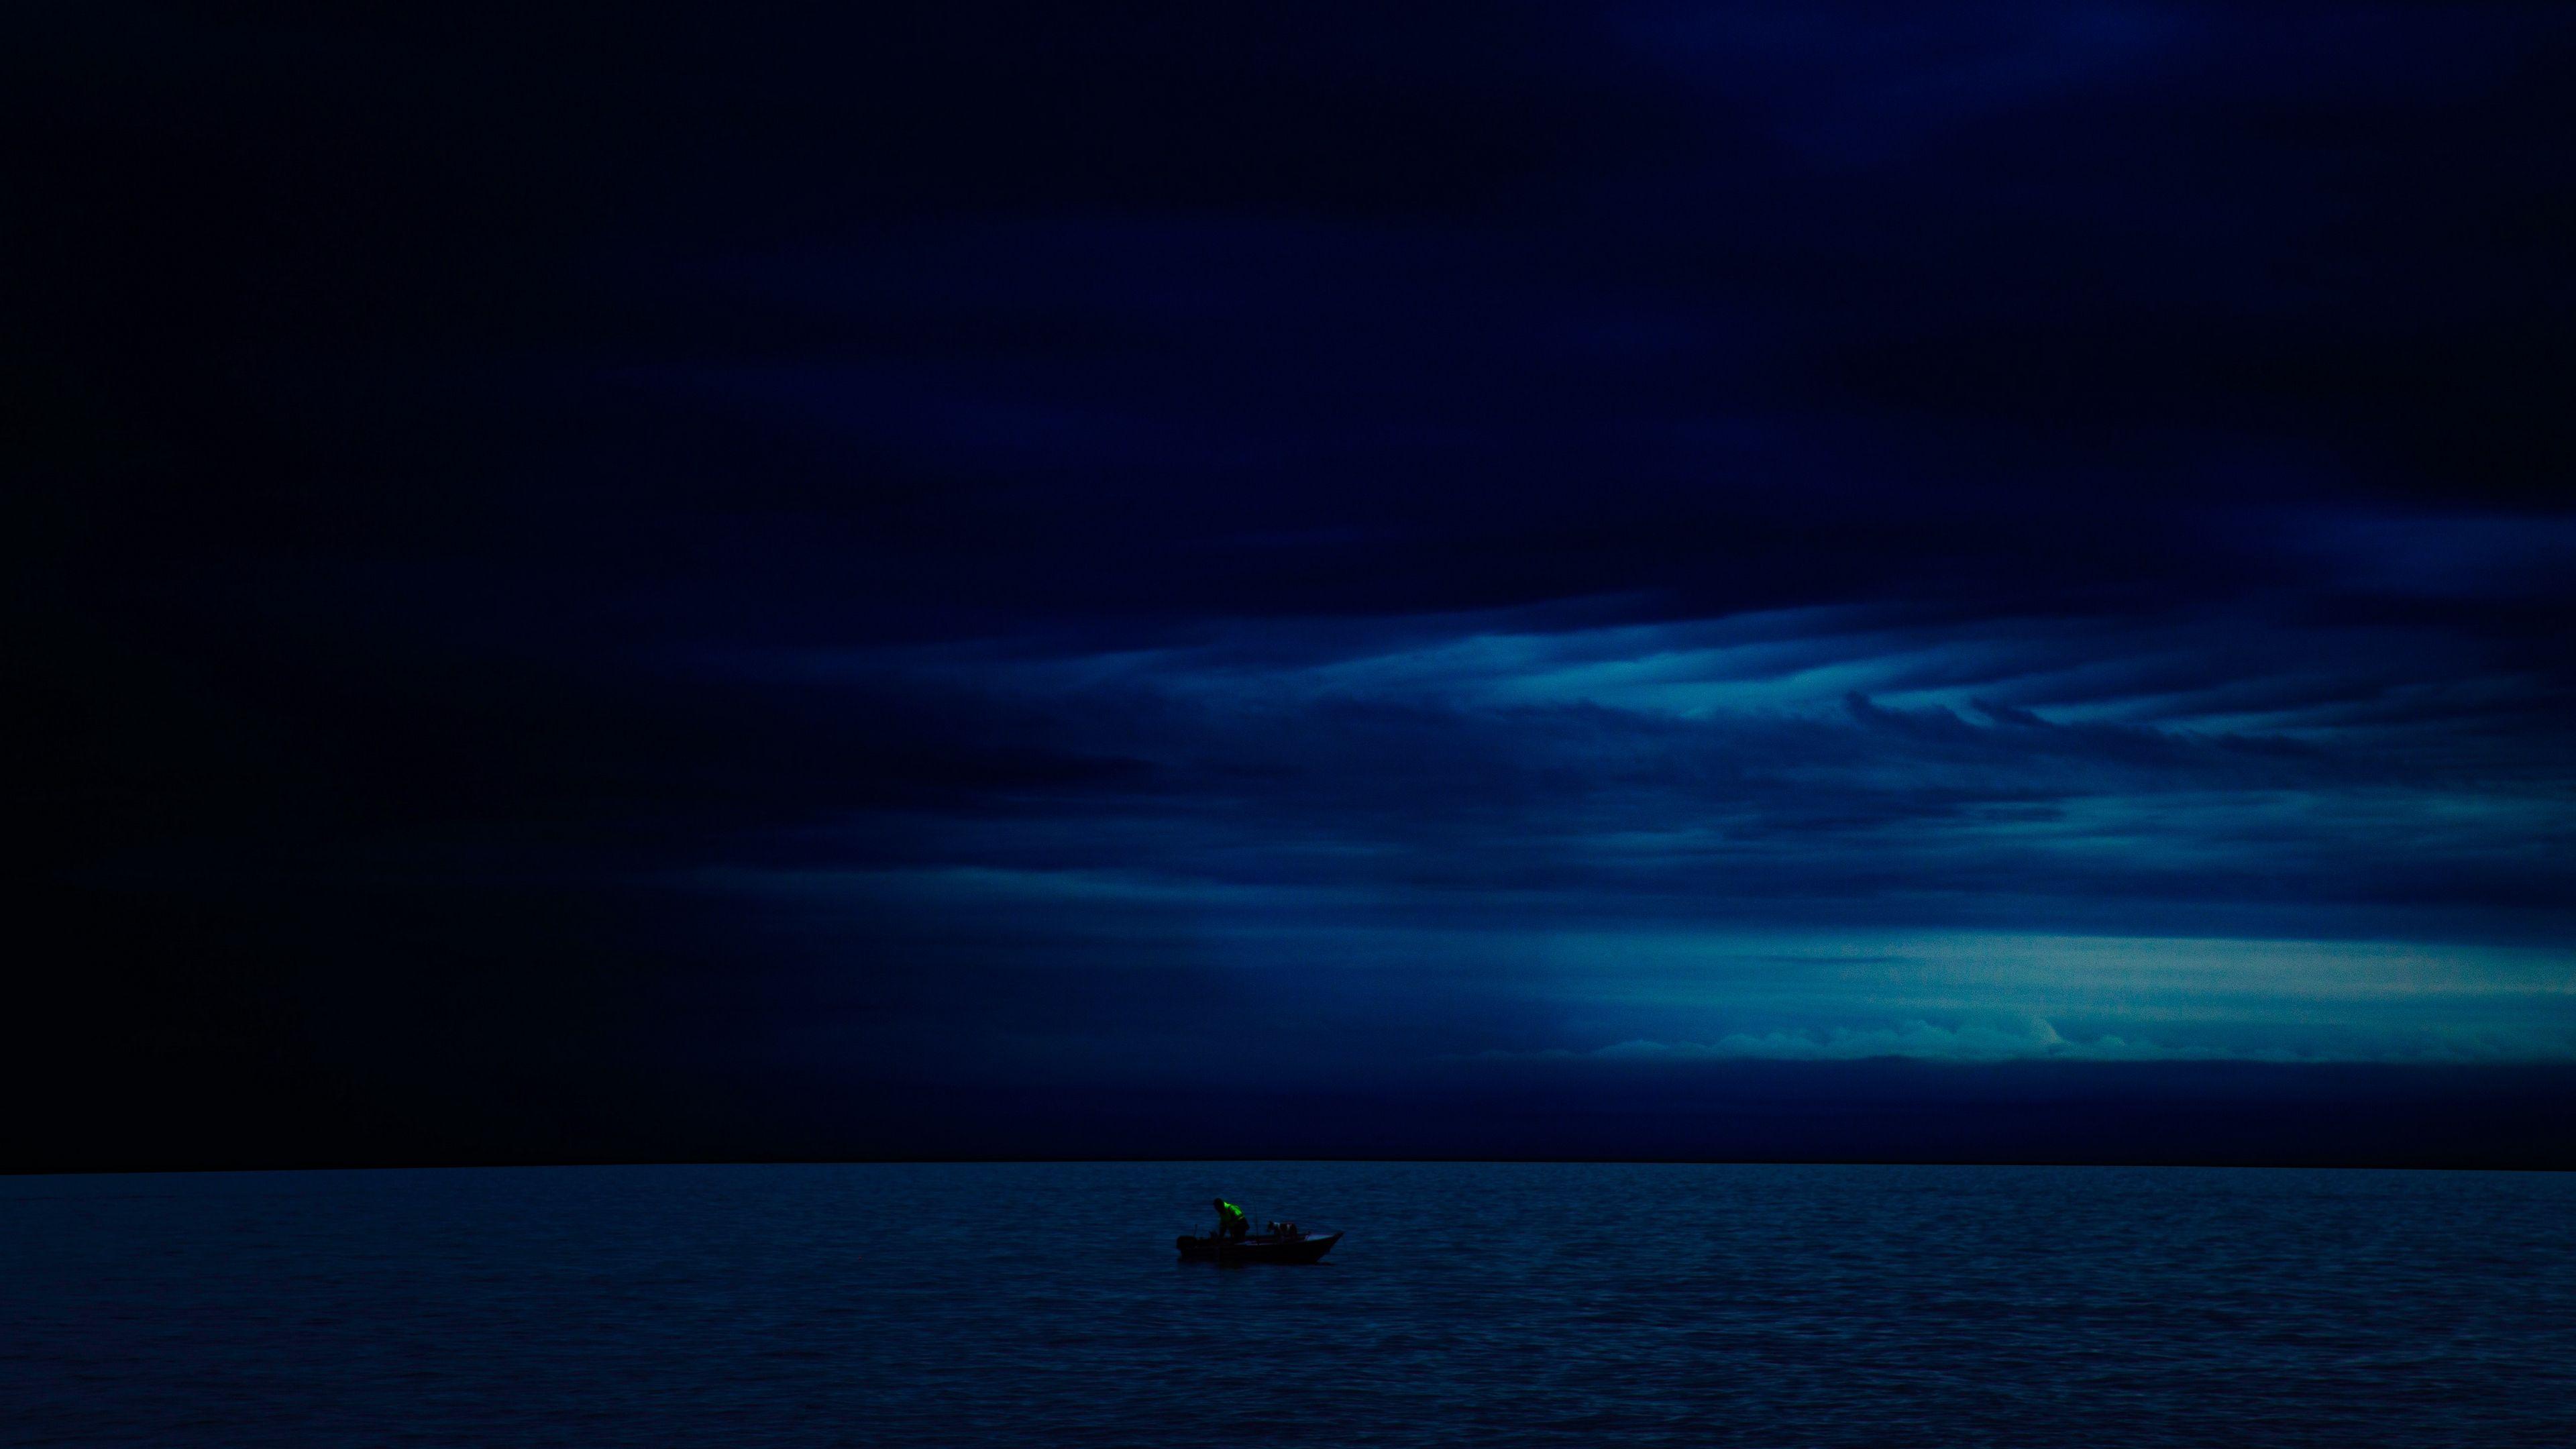 Boat Night Horizon Dark 4k Night Horizon Boat In 2020 Ocean Wallpaper Nature Wallpaper Night